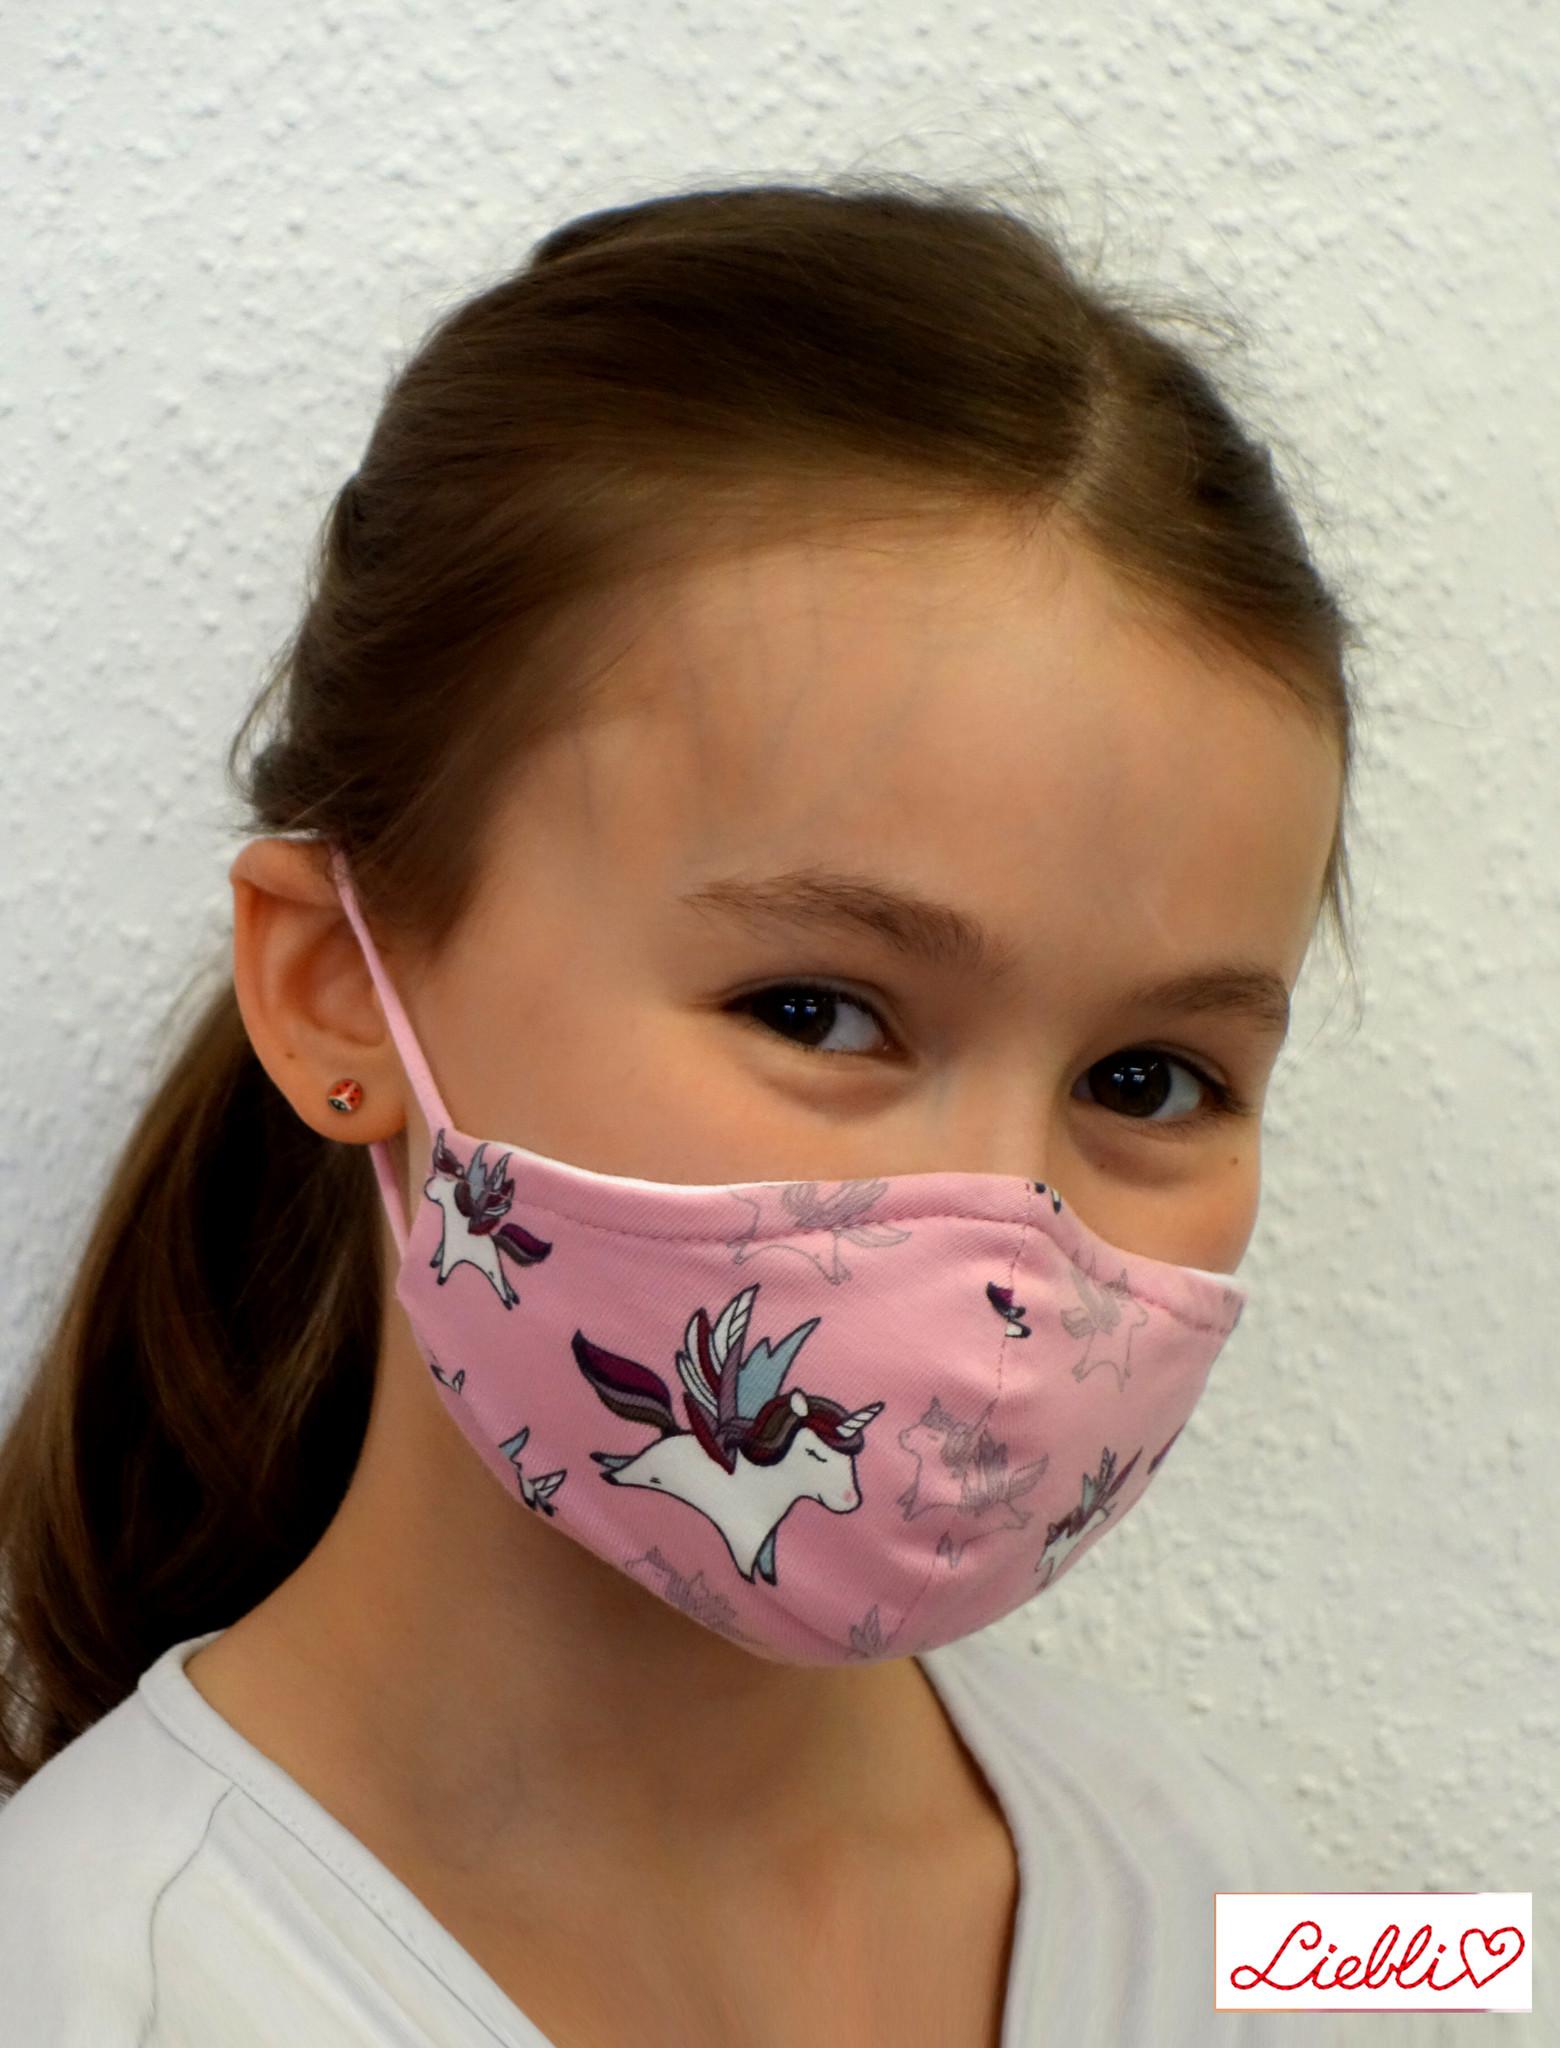 Kindermaske, Kinder Mundschutz, Mund-Nasen-Maske Einhorn rosa